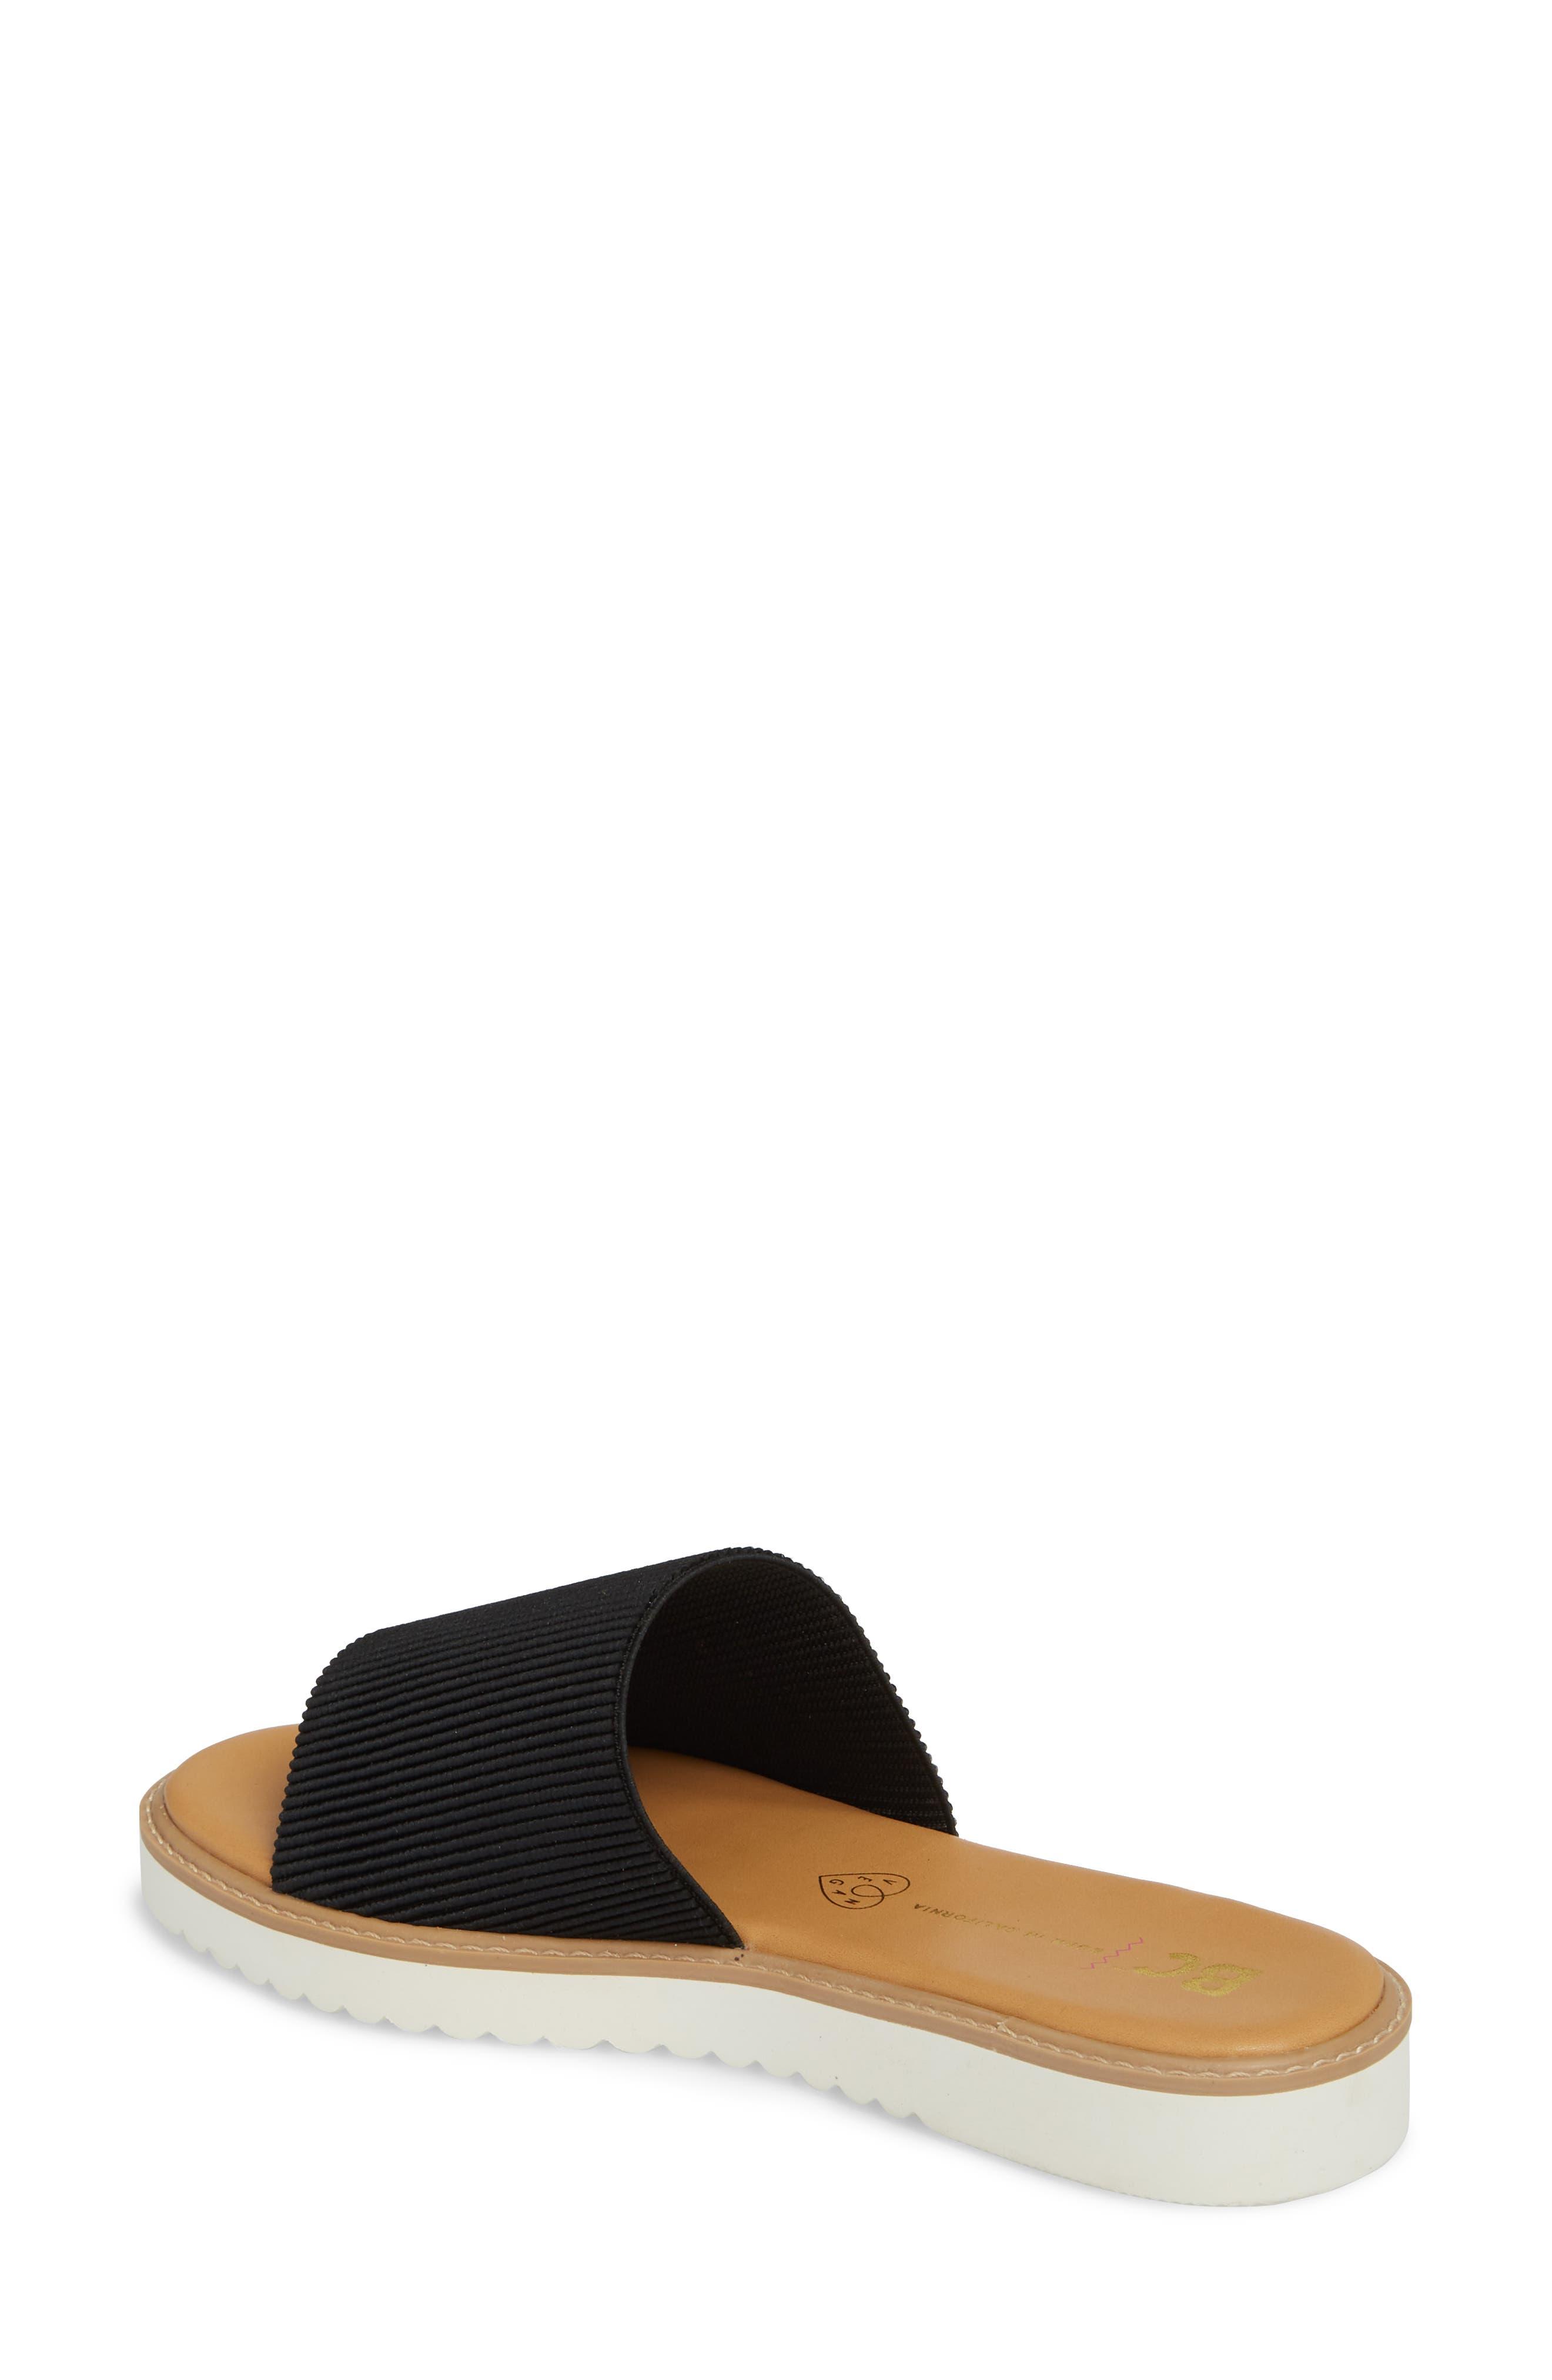 Cotton Candy Slide Sandal,                             Alternate thumbnail 2, color,                             001